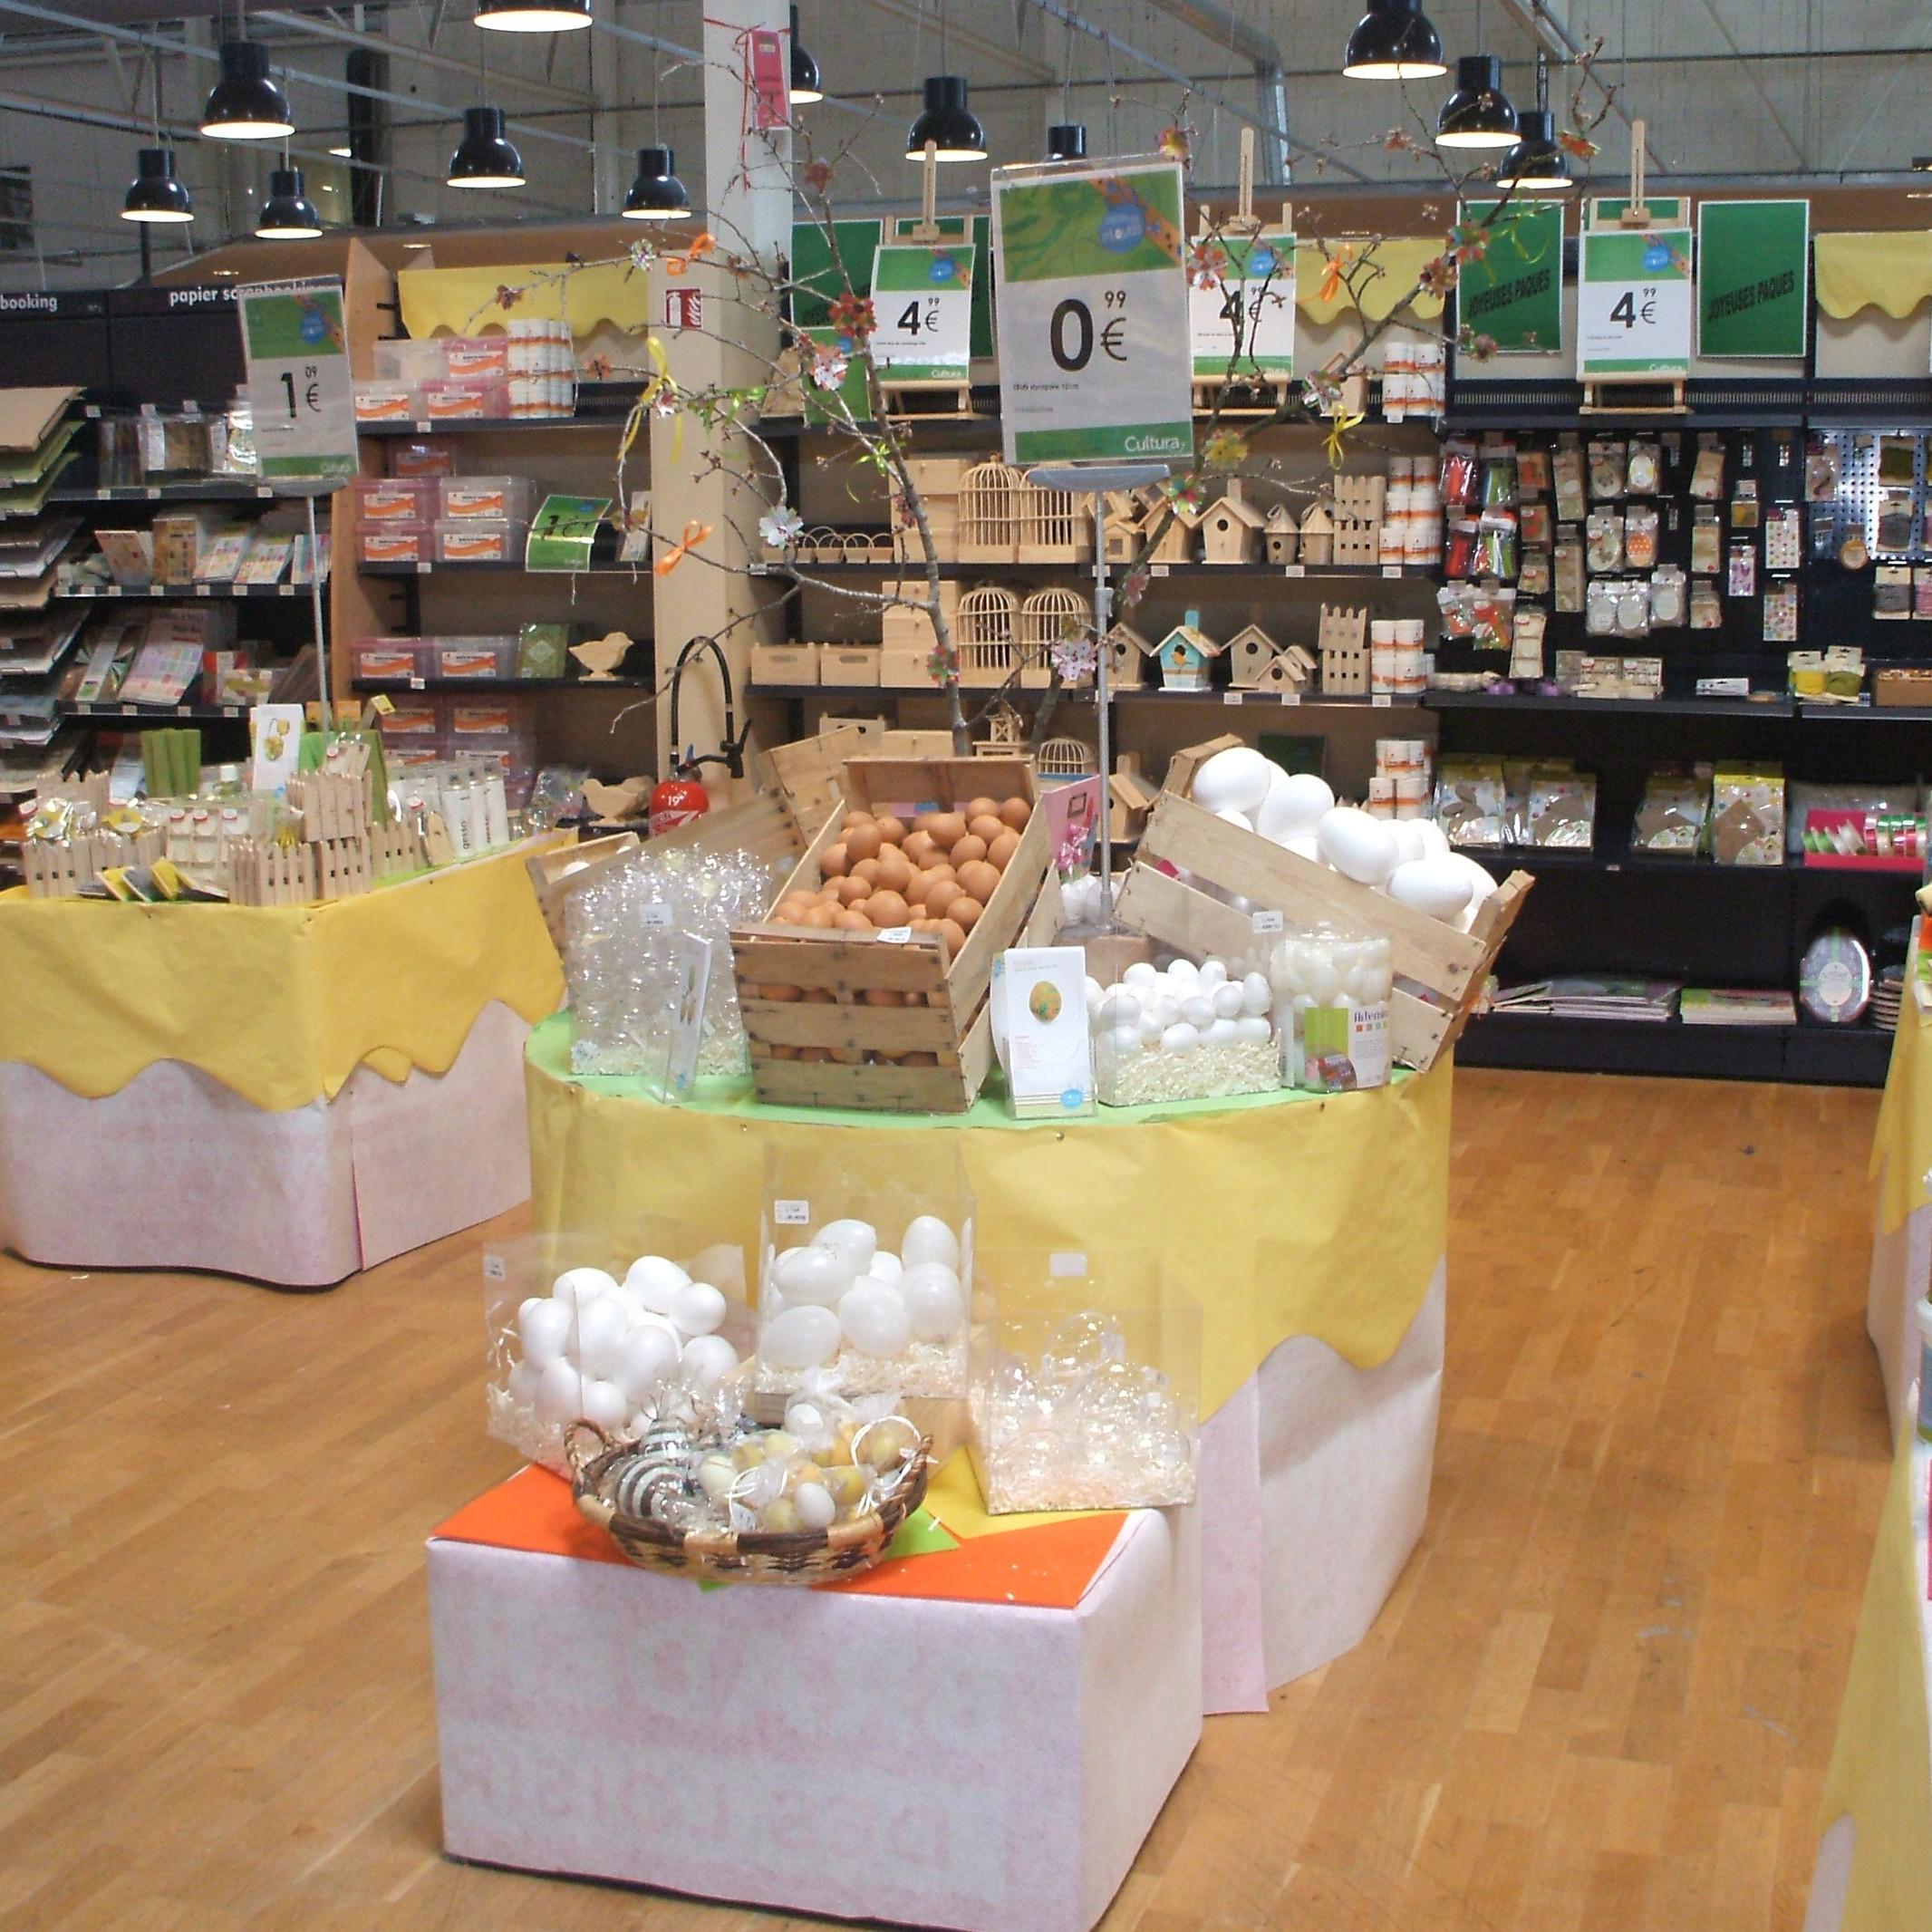 Cultura mandelieu les magasins for Plattard carrelage bourg en bresse